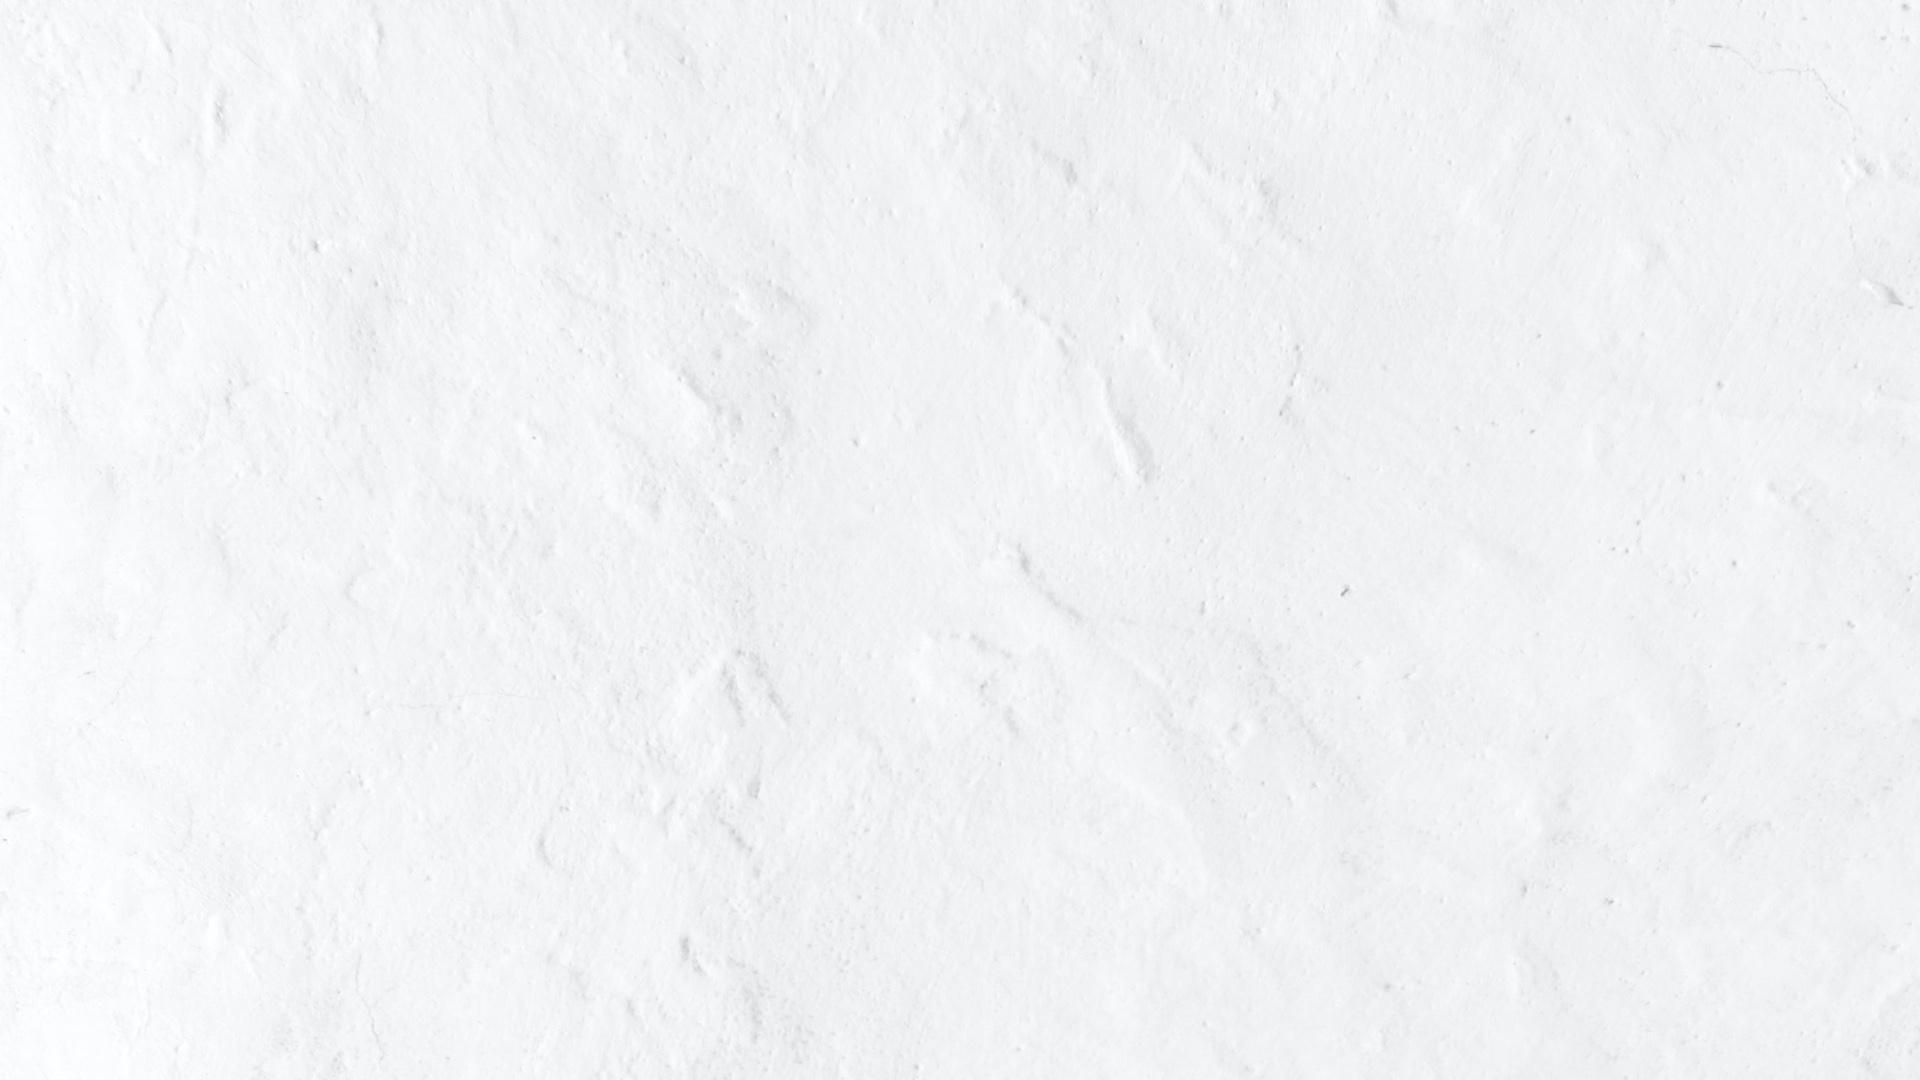 Zoomやskypeでの面接や打ち合わせに使える無料のバーチャル背景素材 凹凸のある白くペイントされた壁 バーチャル背景の素材集 V背景